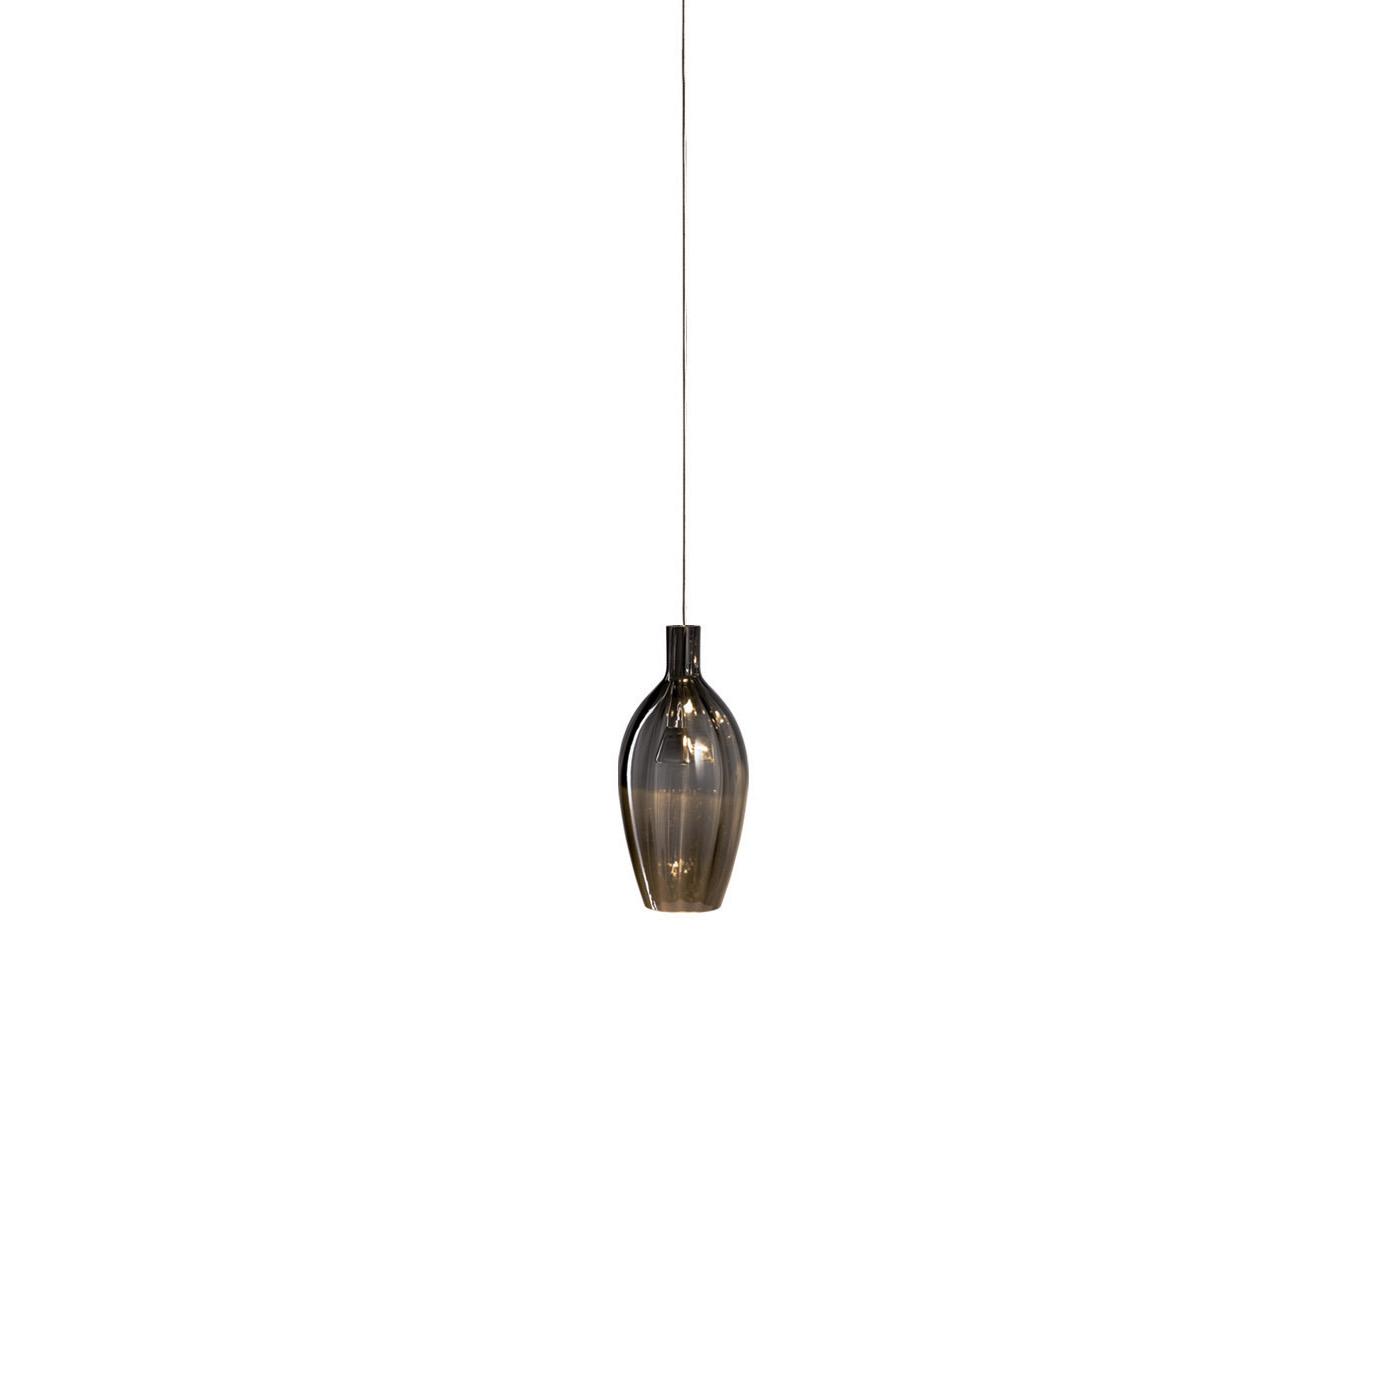 STENG LICHT GmbH Steng LED-Pendelleuchte GLORI-A O Kristallglas X1010-NG-GGA-O